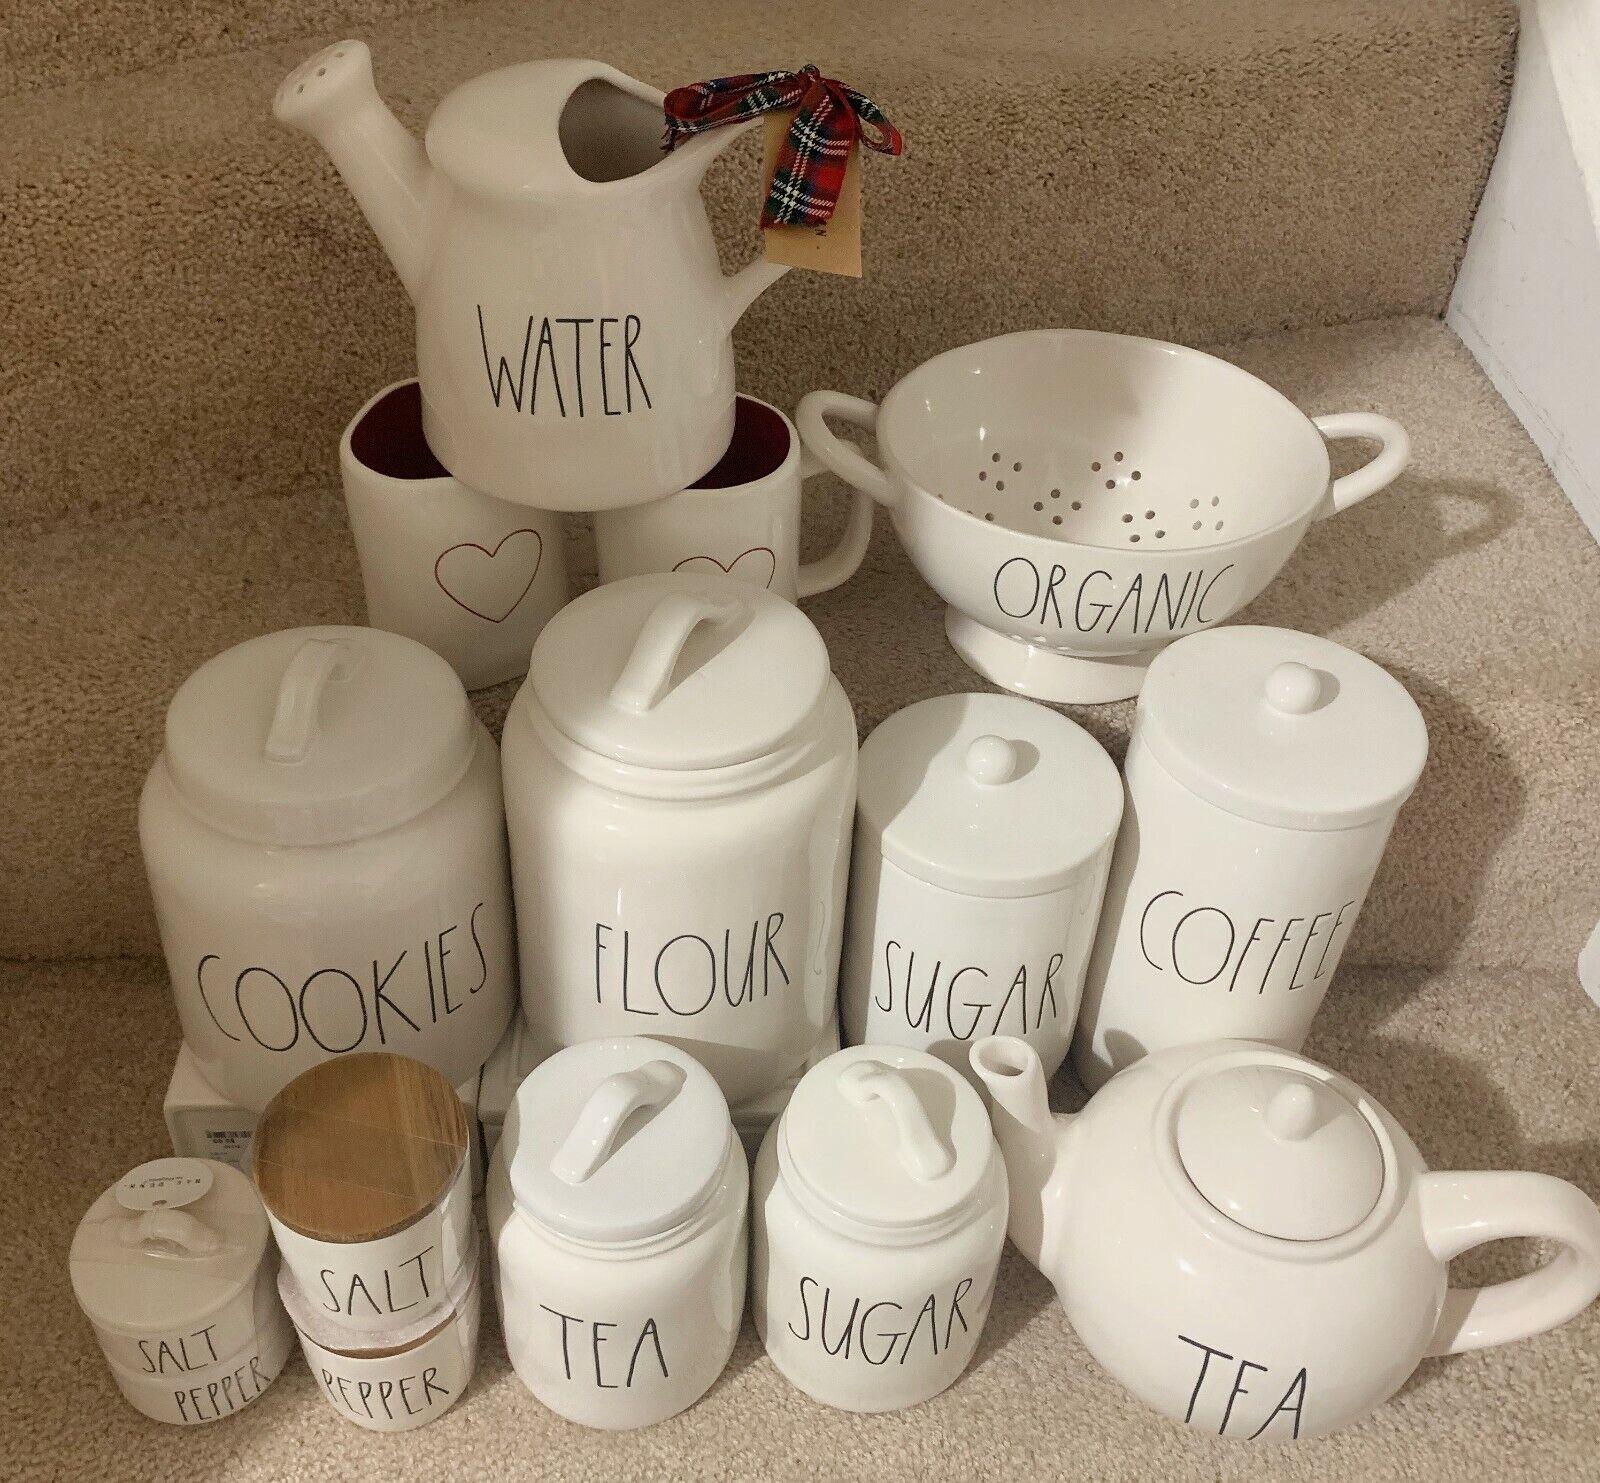 NEW RAE DUNN CANISTER COFFEE TEA SUGAR FLOUR COOKIES SALE/PE